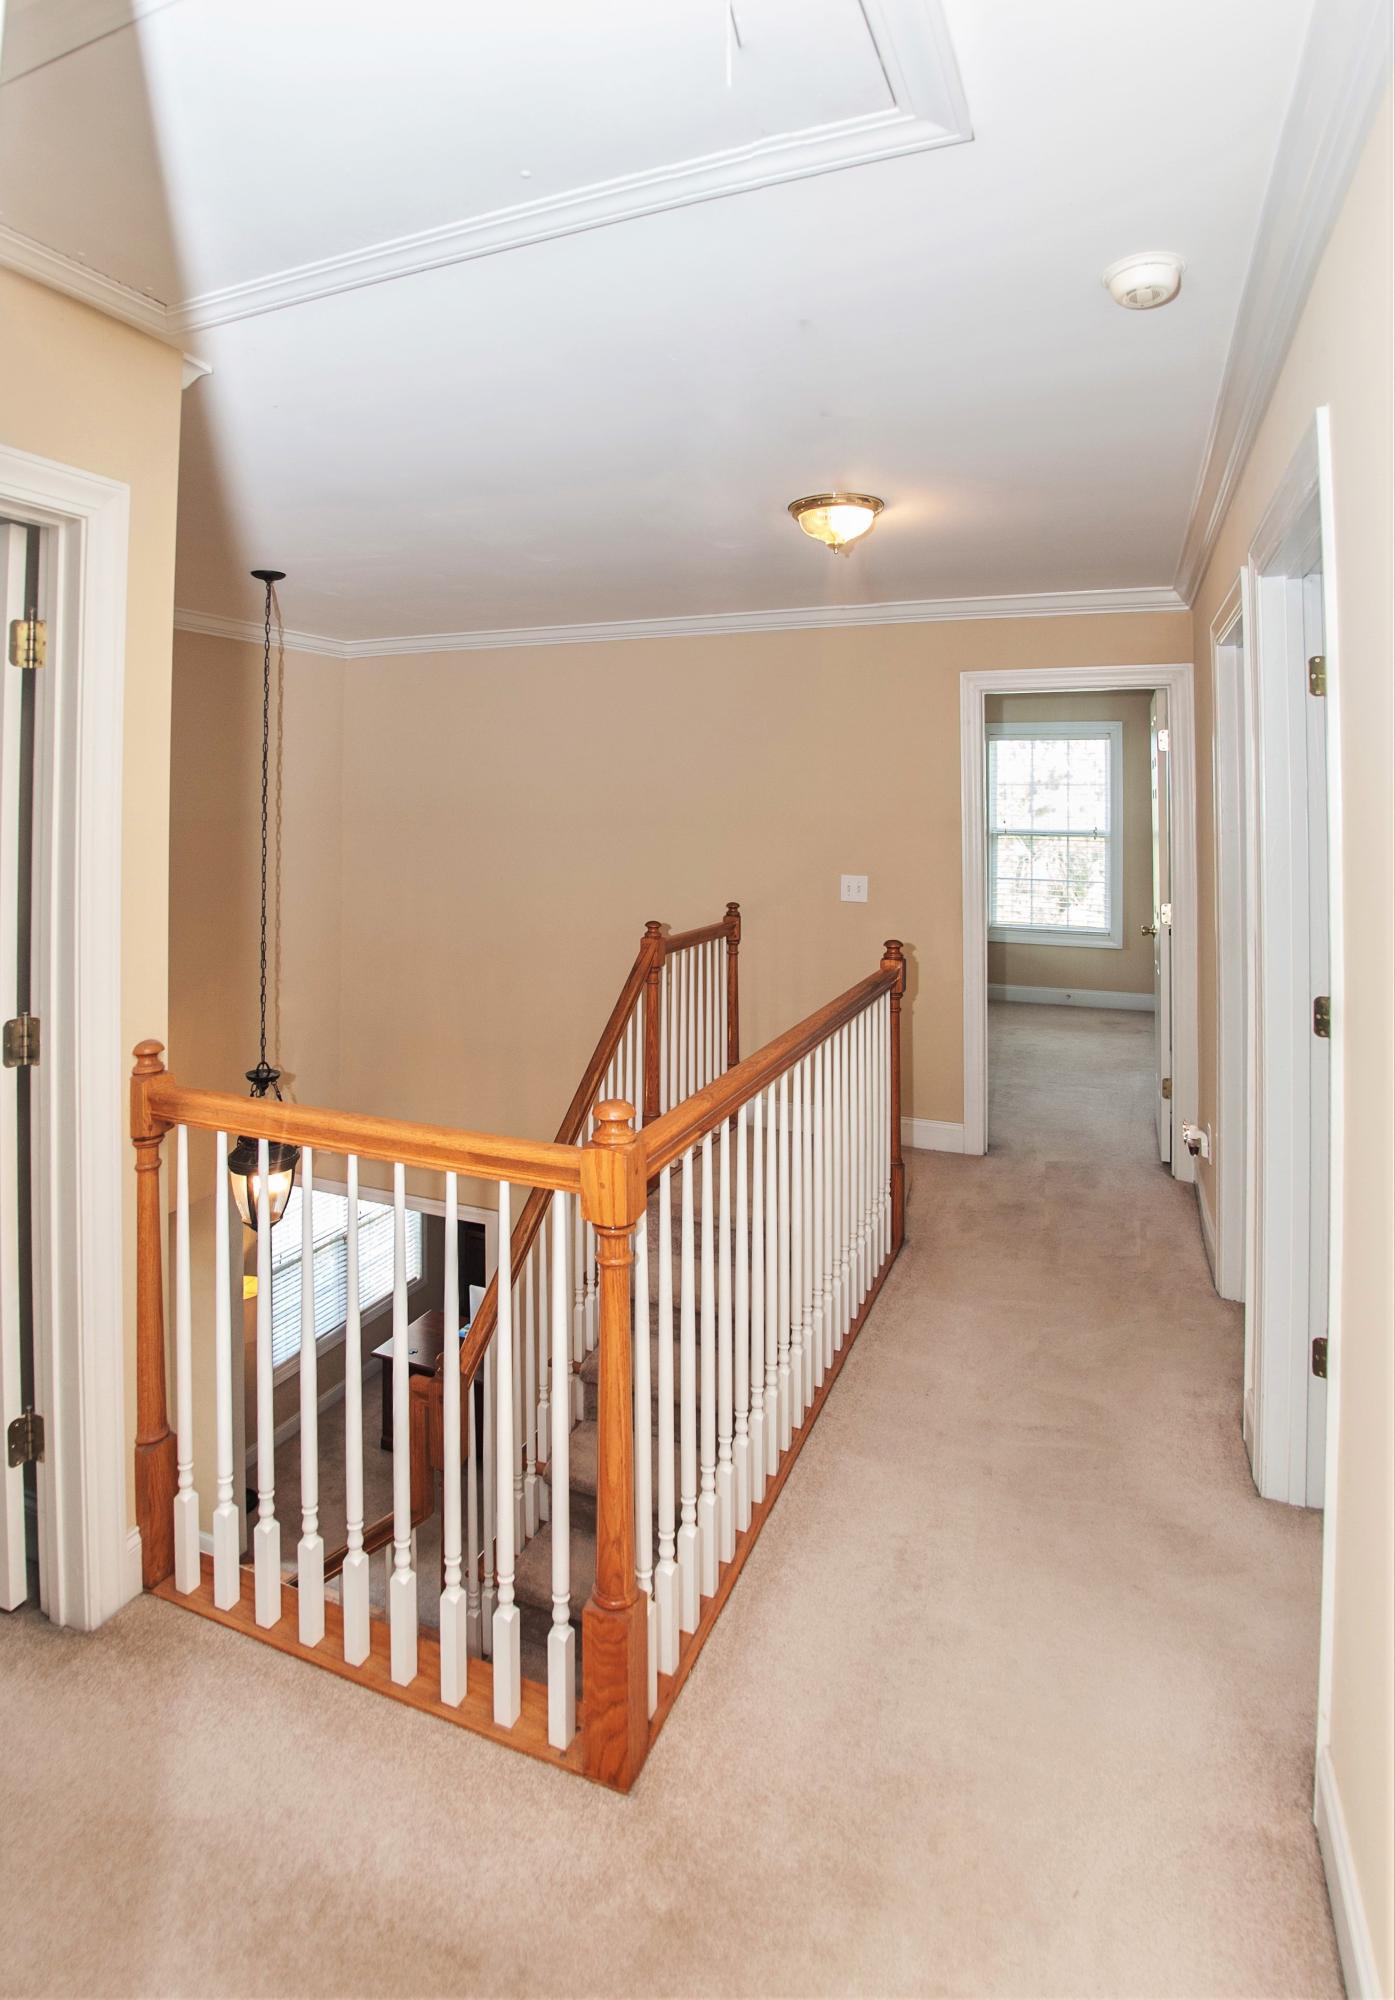 Dunes West Homes For Sale - 2520 Deer Walk, Mount Pleasant, SC - 53